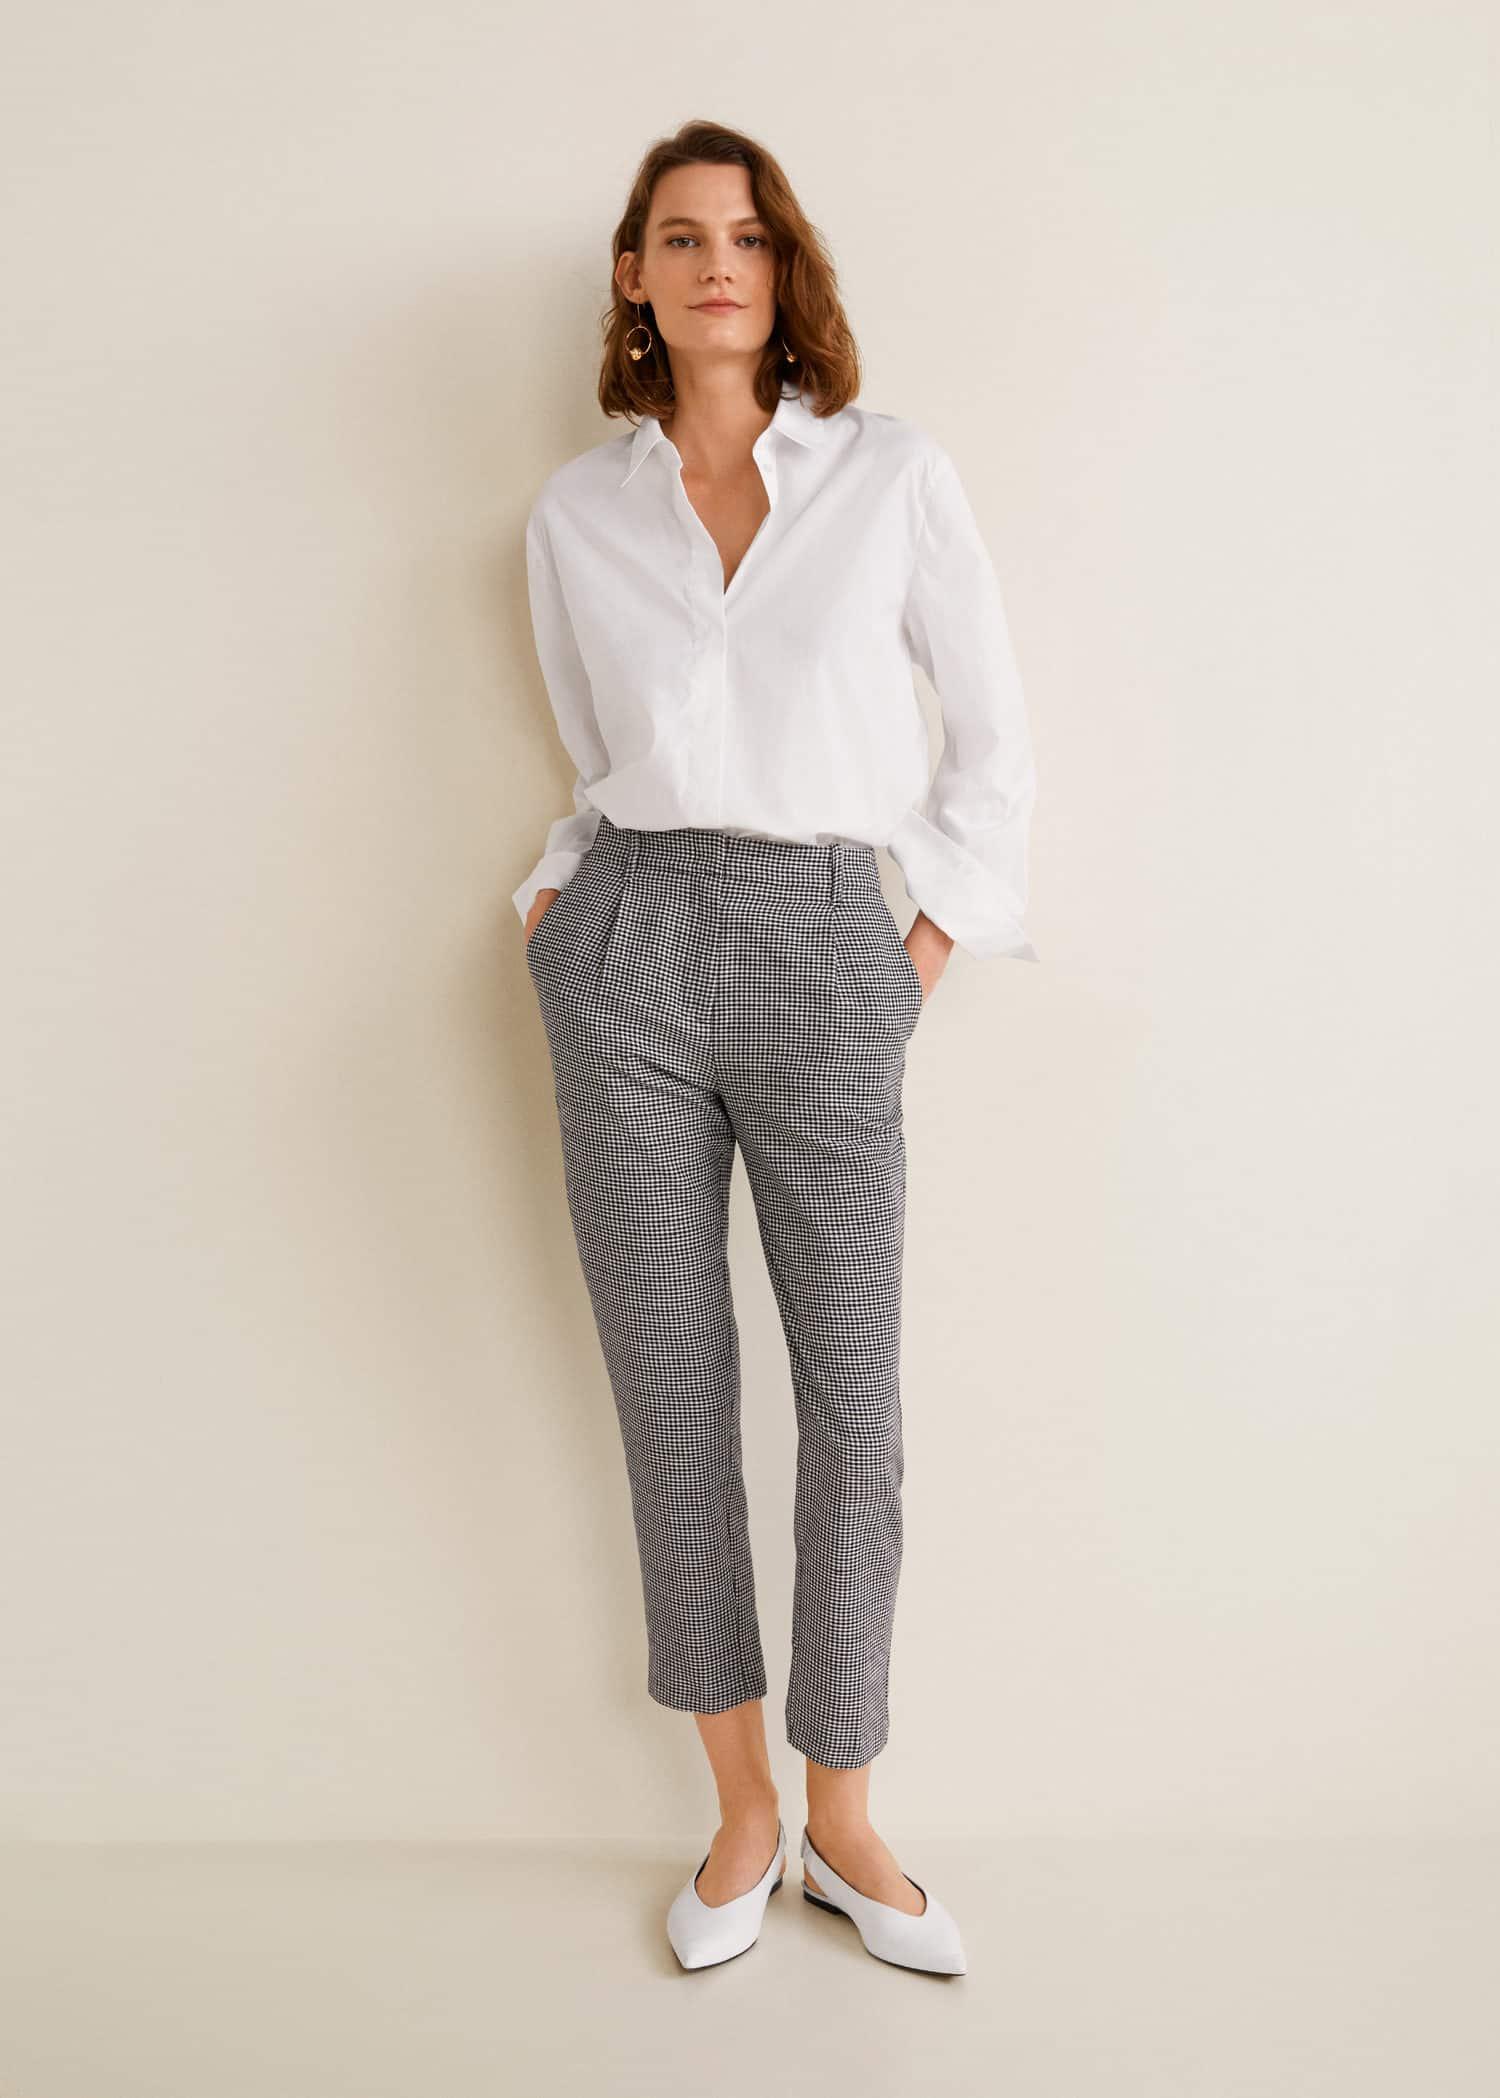 pantalon femme vichy